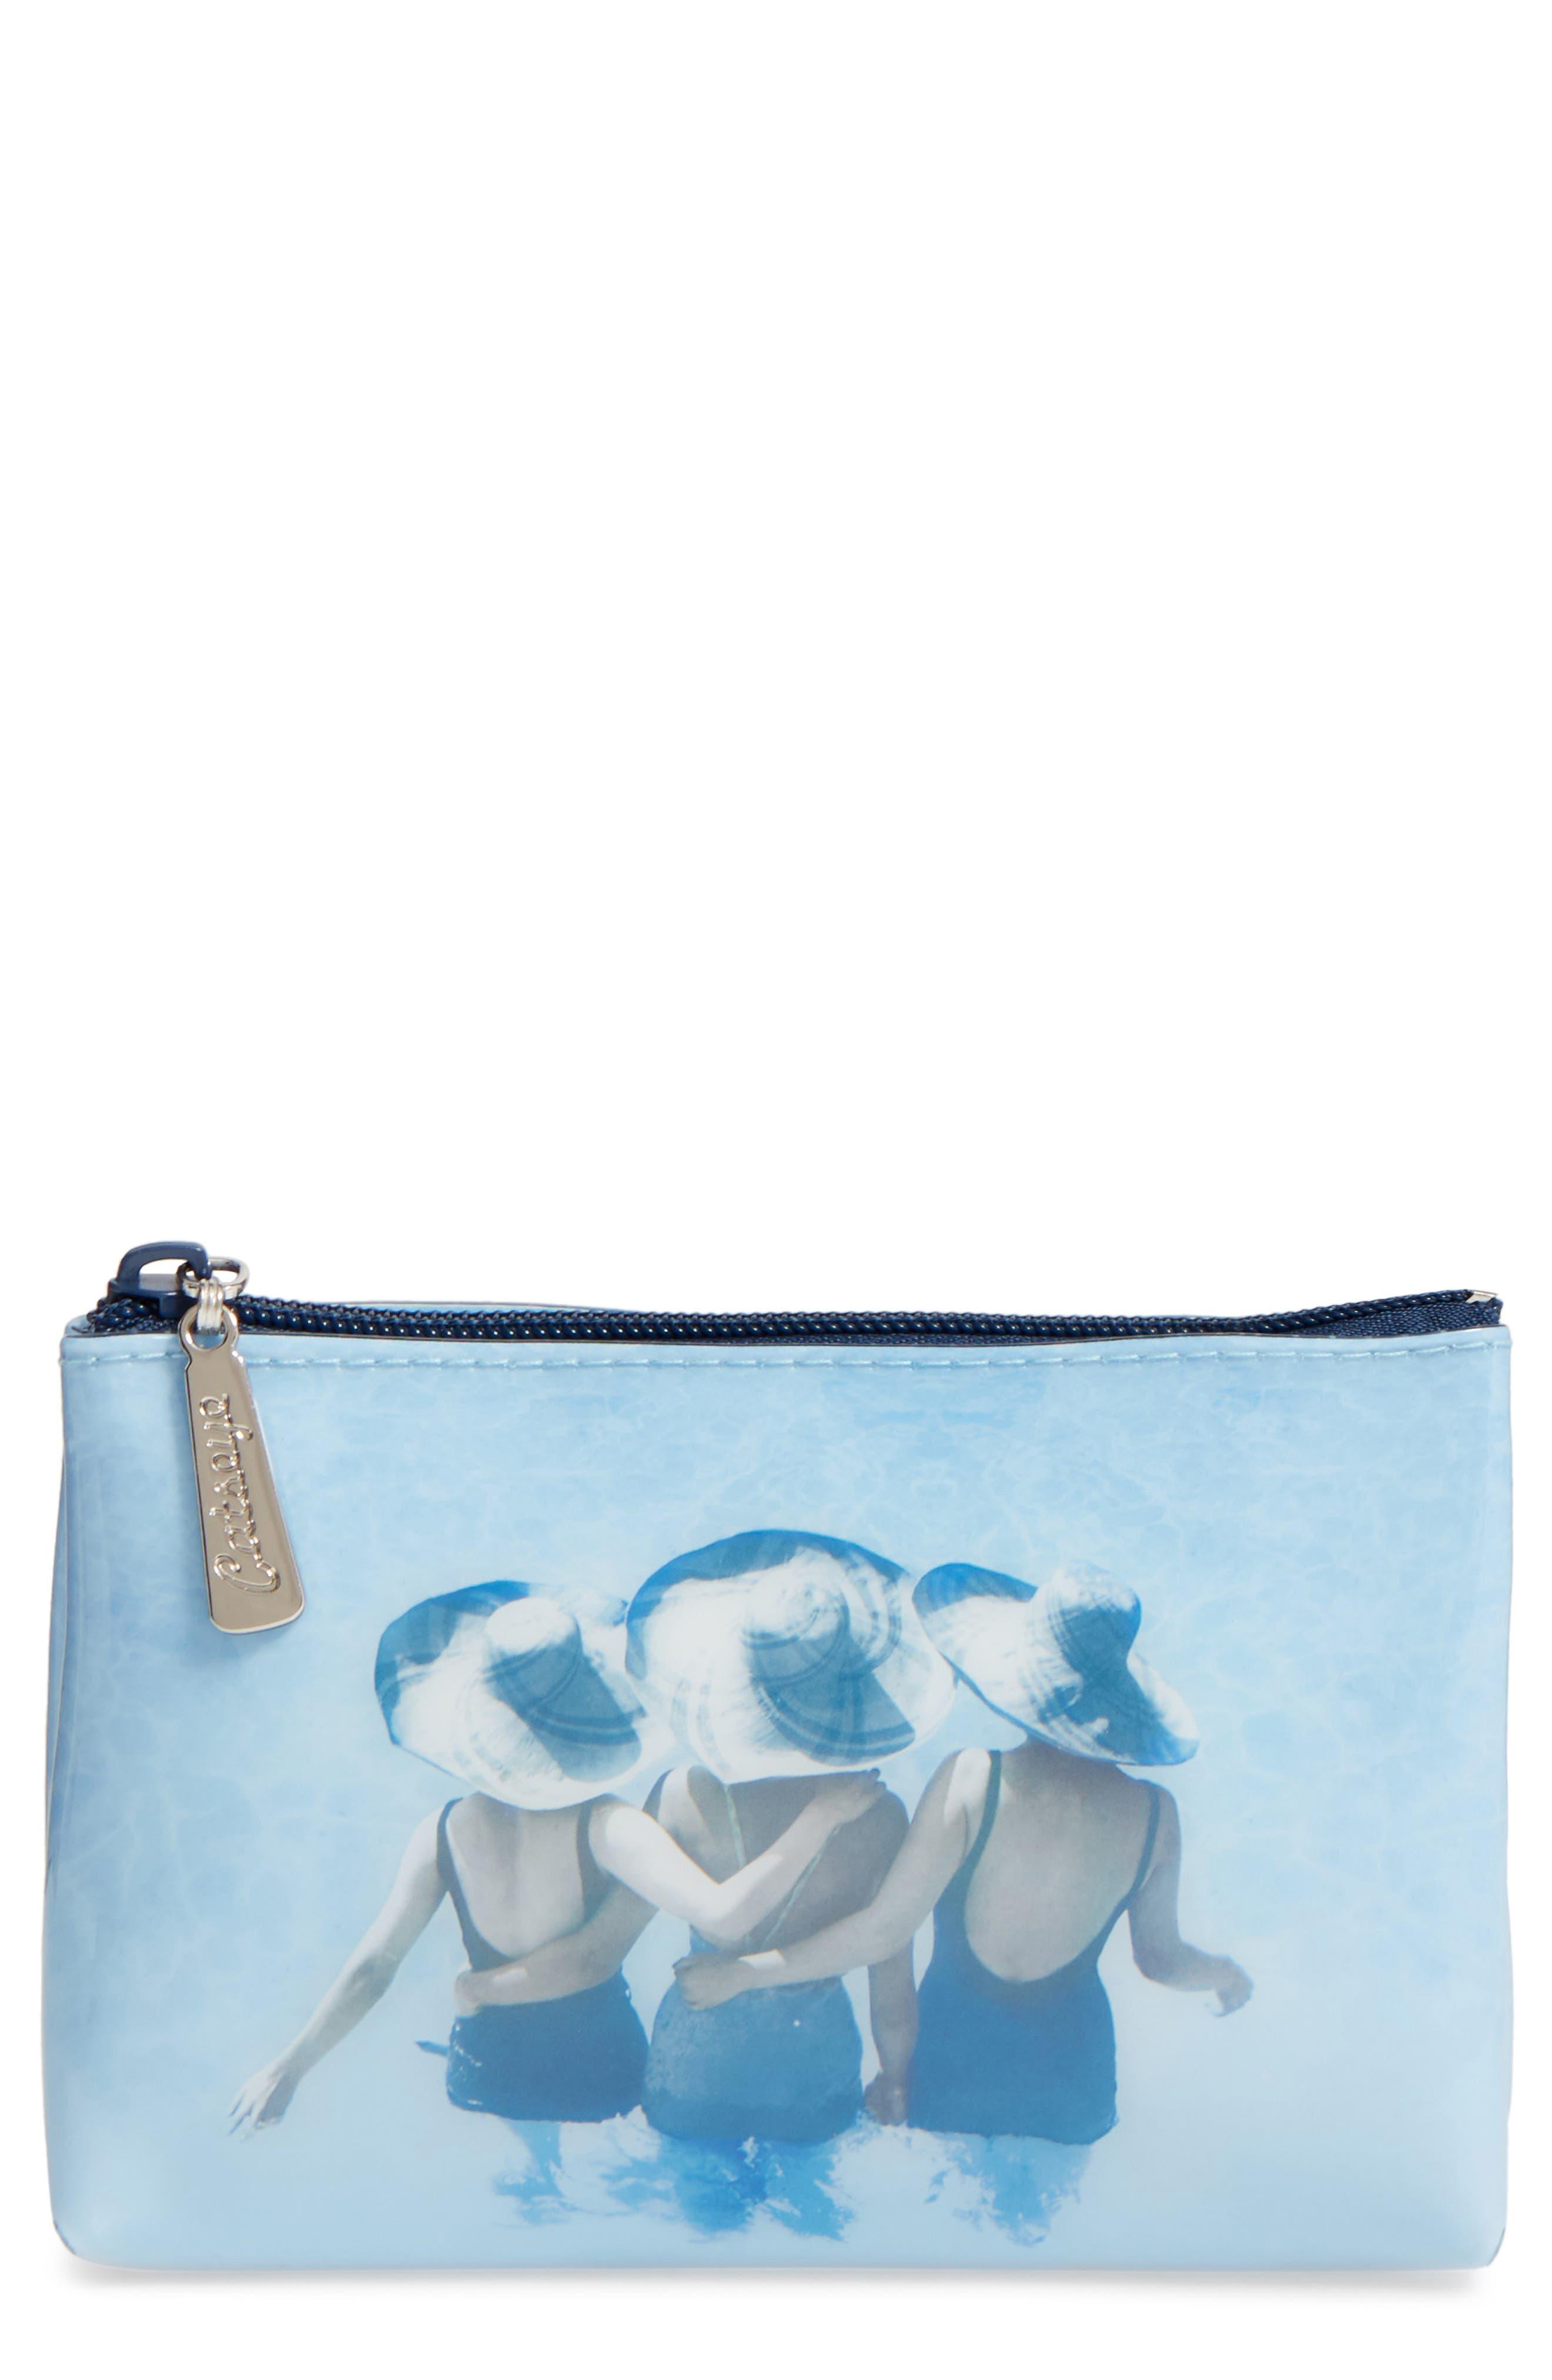 Main Image - Catseye London Beach Hats Zip Pouch